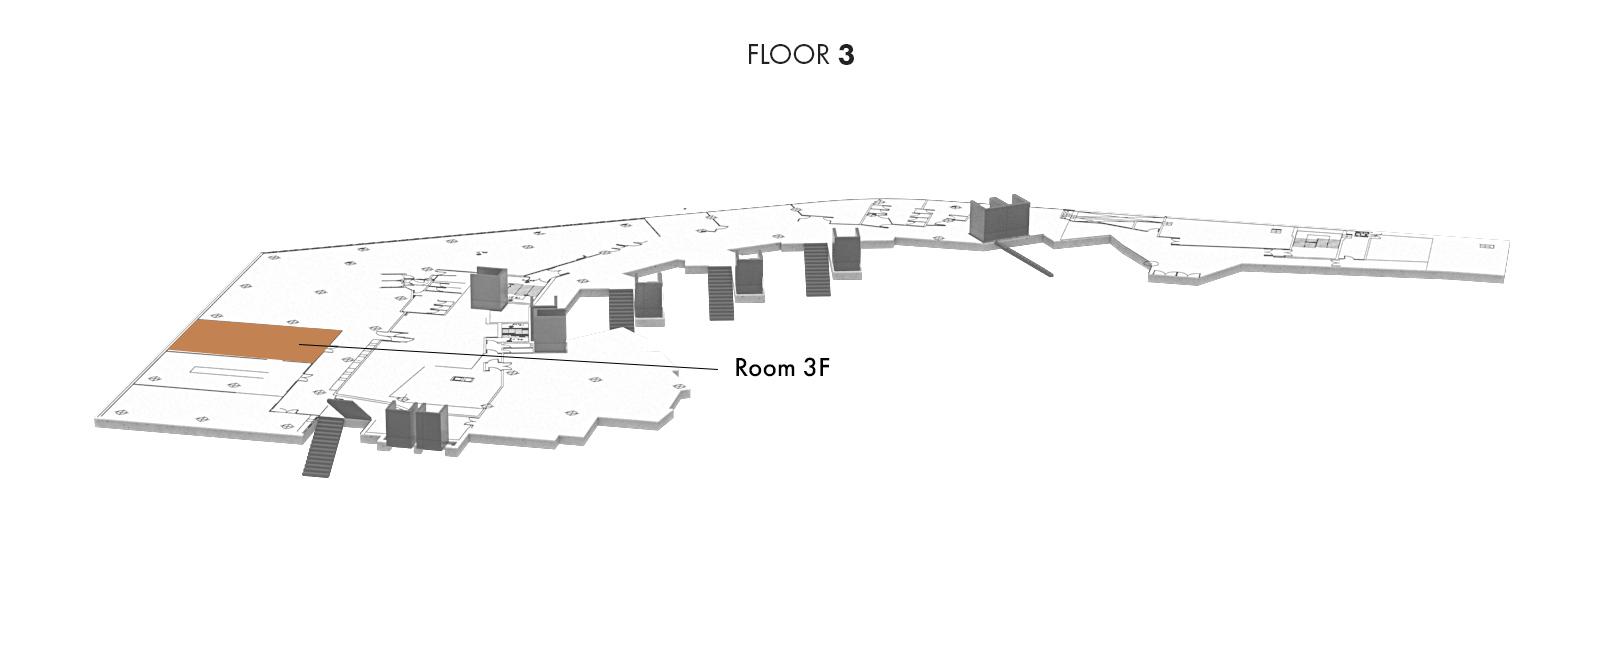 Room 3F, Floor 3   Palacio Euskalduna Jauregia